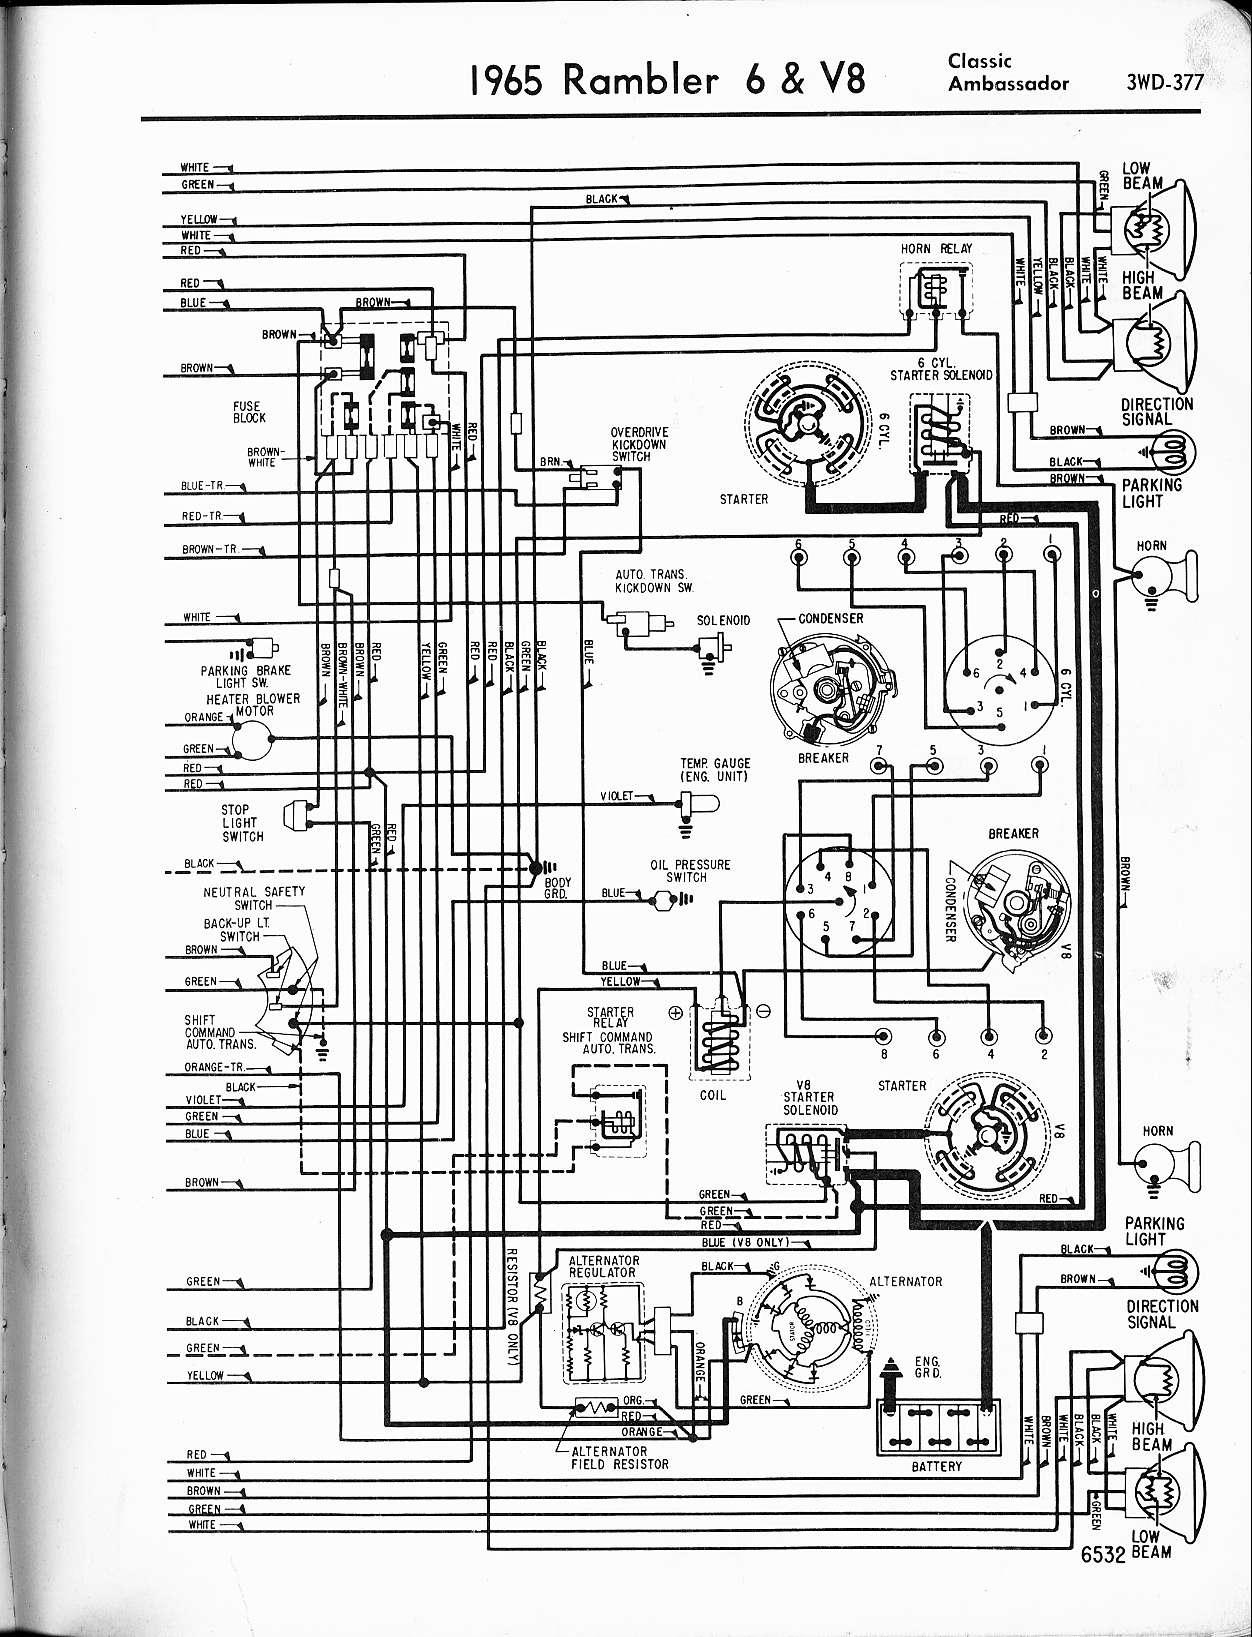 Strange Rambler Wiring Diagrams The Old Car Manual Project Wiring Cloud Xortanetembamohammedshrineorg